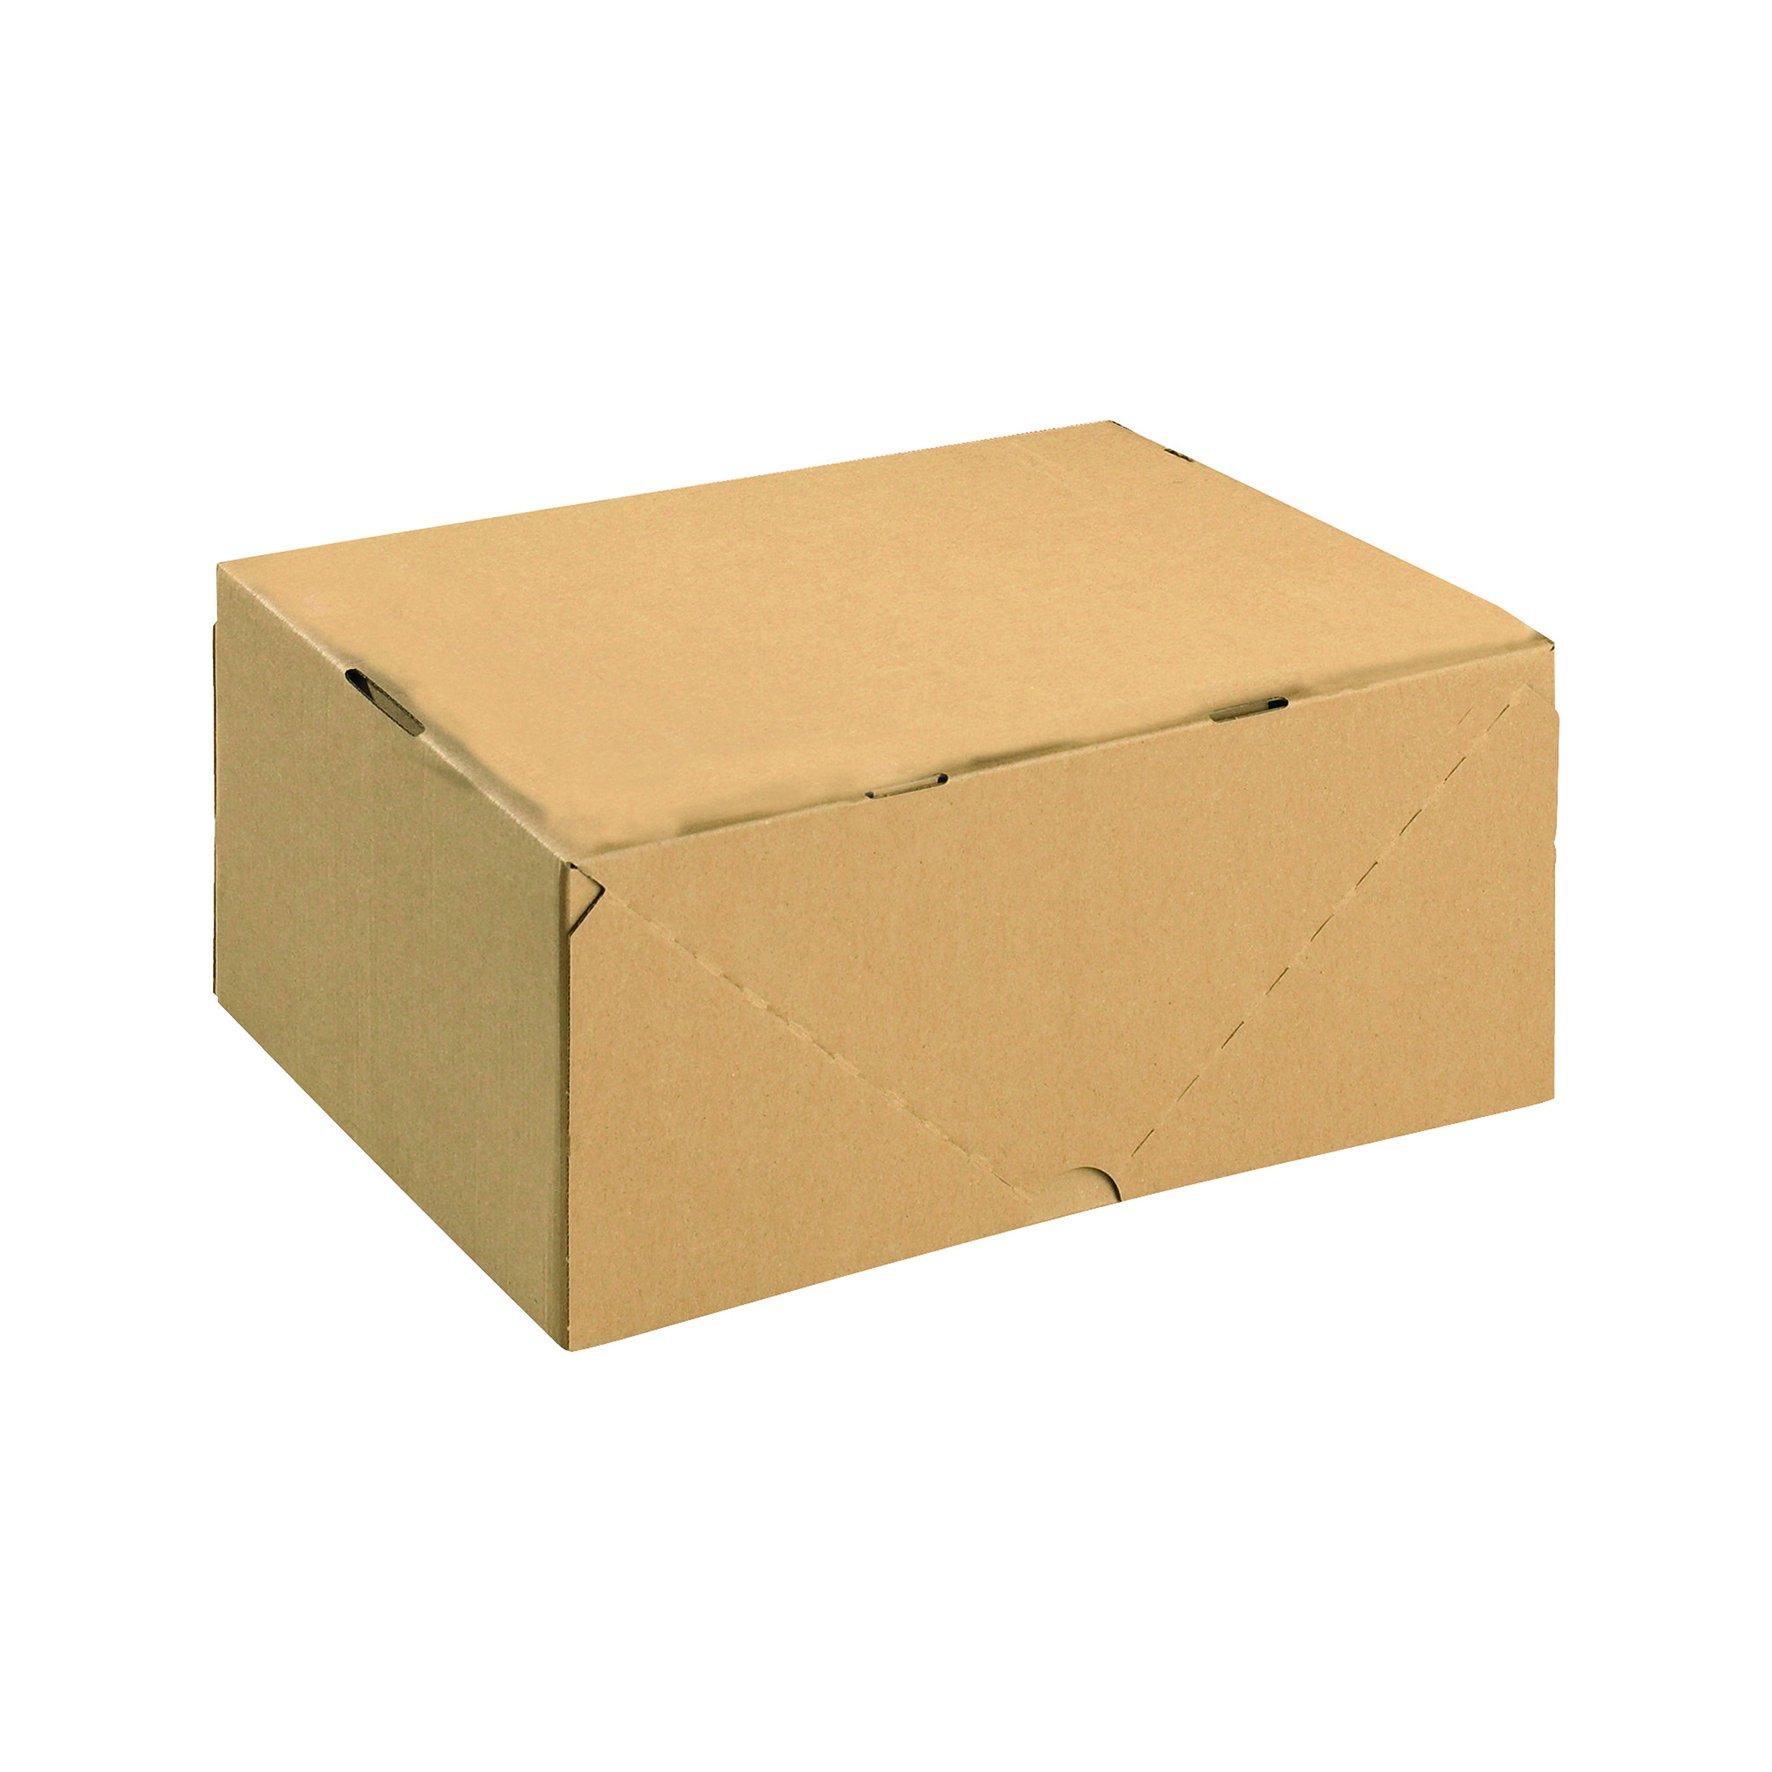 Value Box Carton & Lid 305x215x150mm (10)